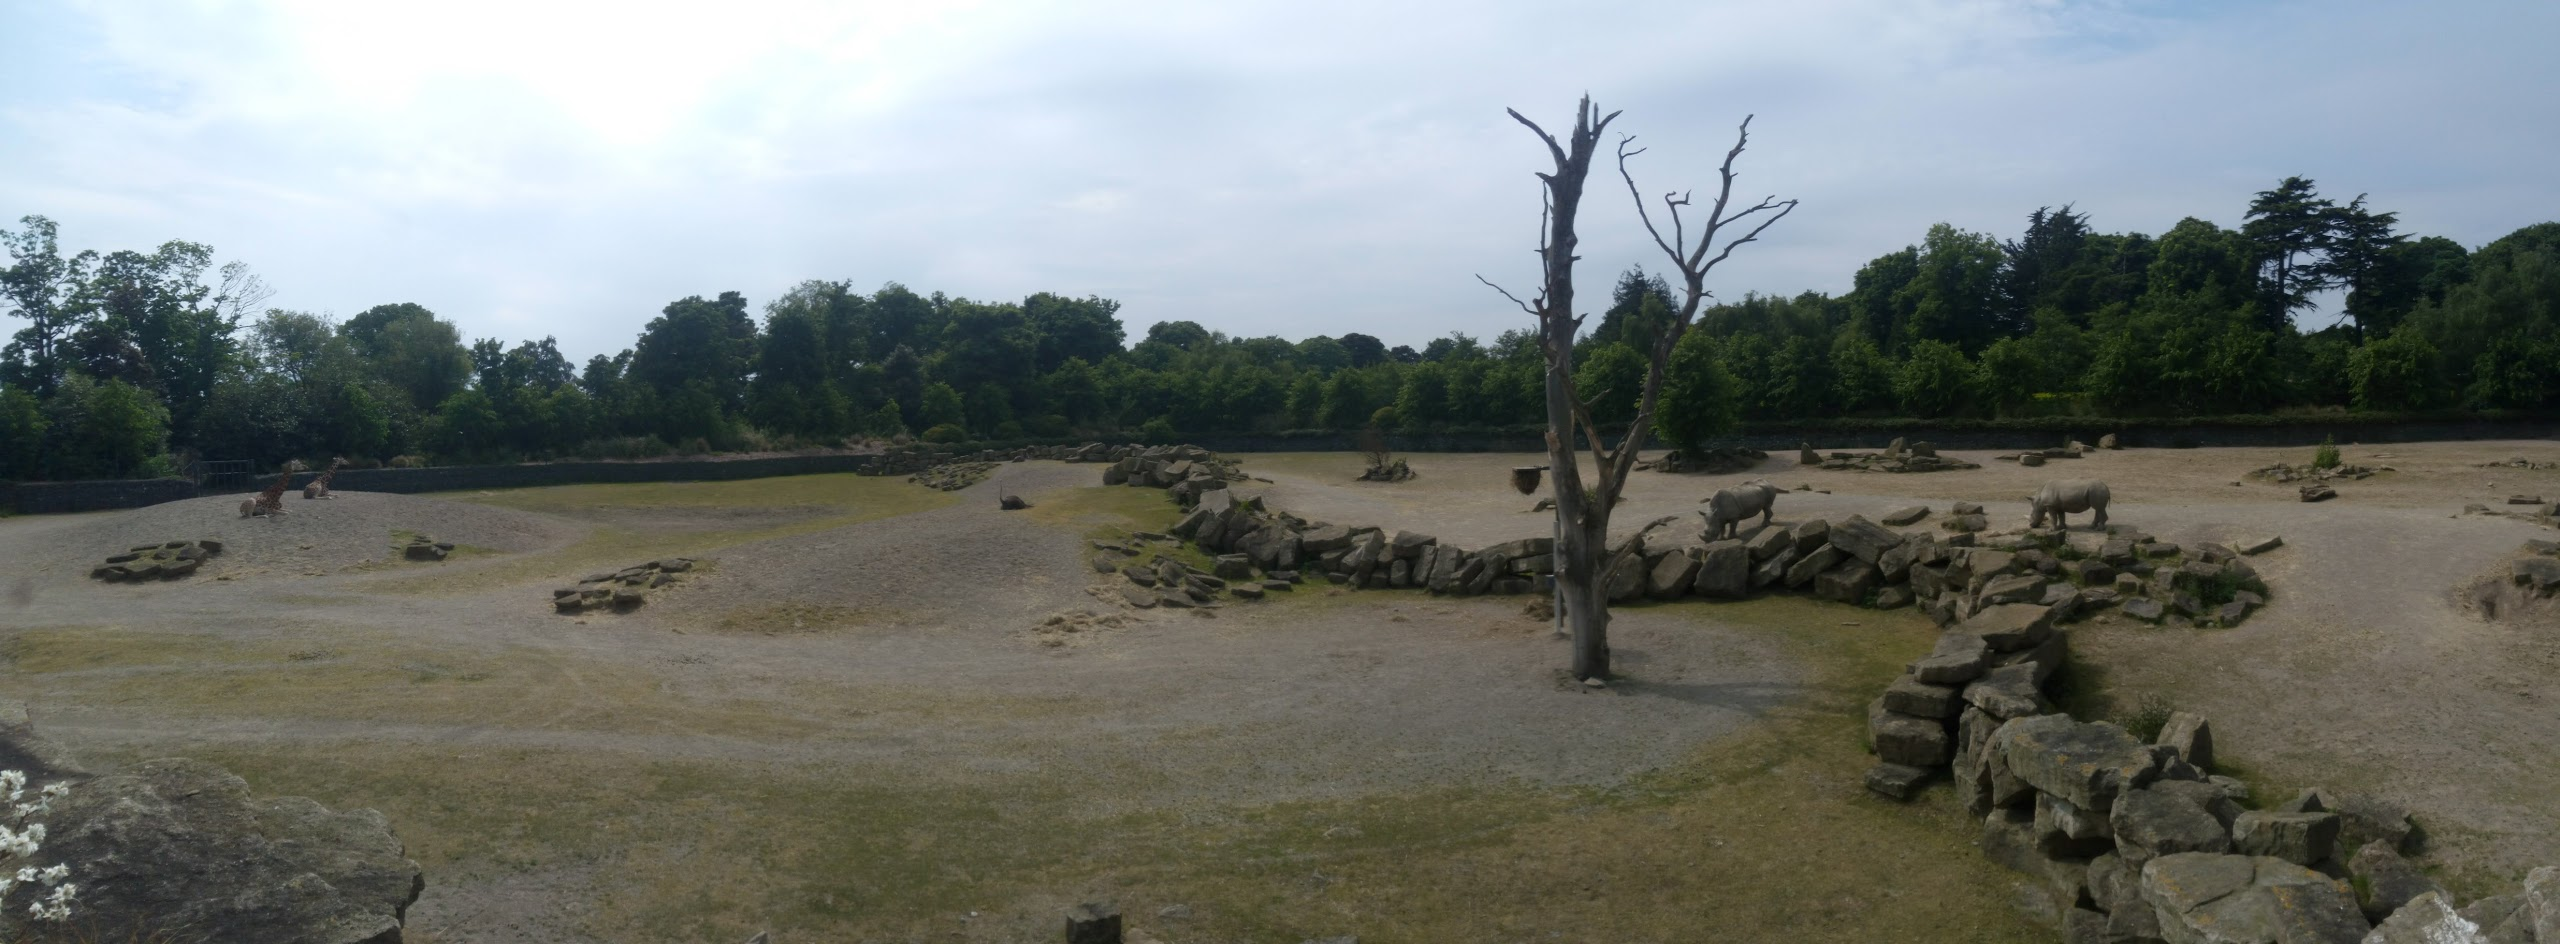 Dublino parco